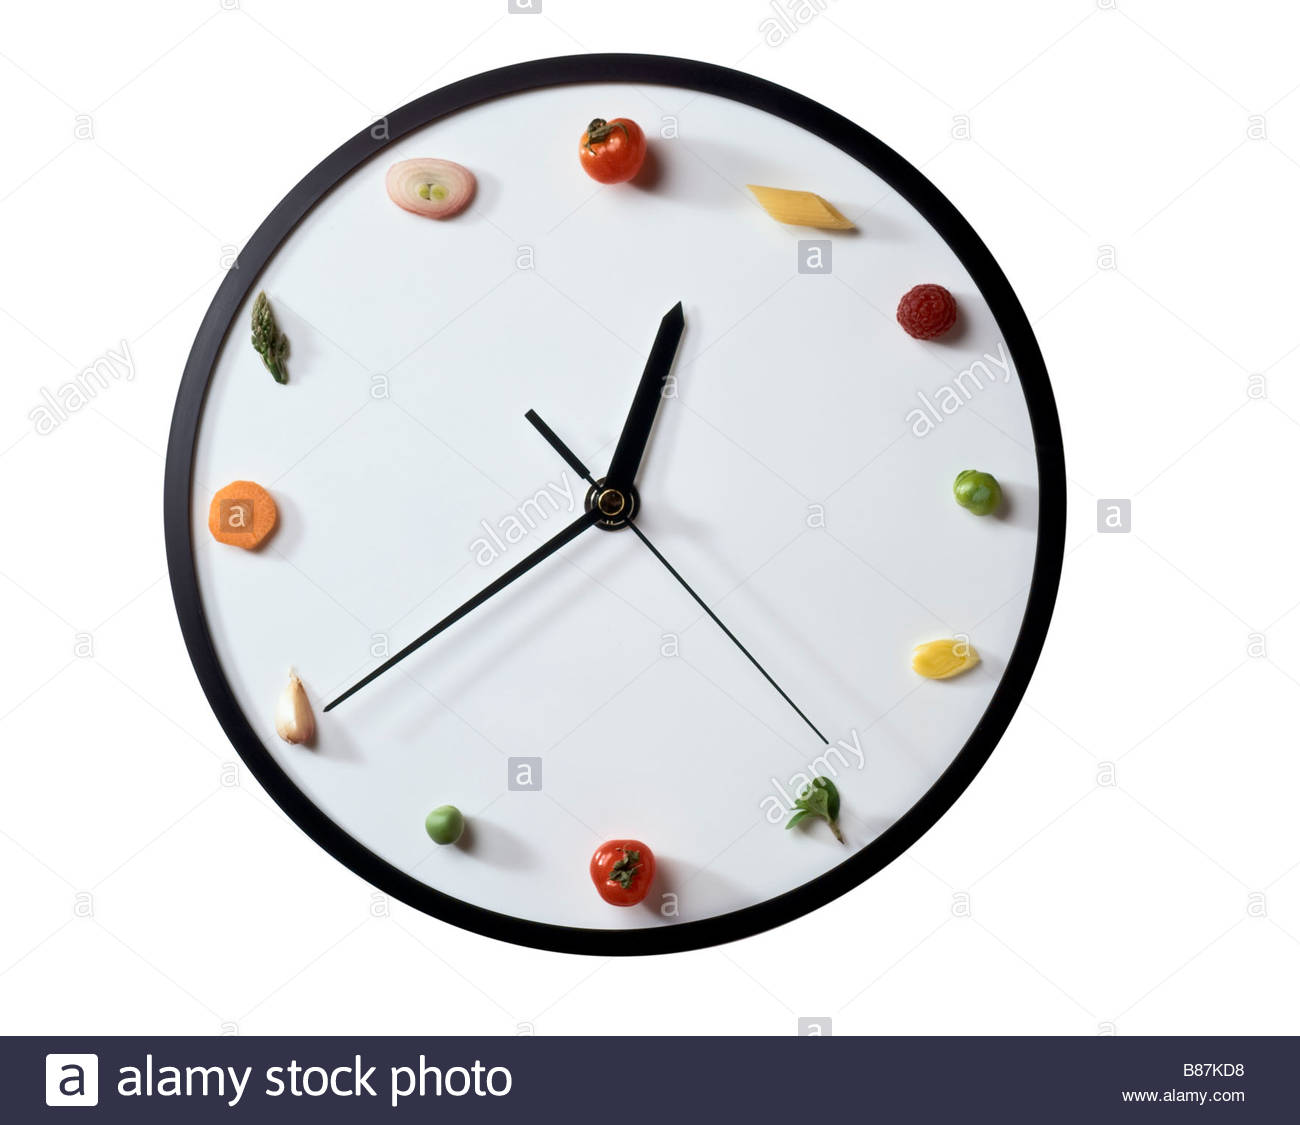 symbolic clock - Stock Image